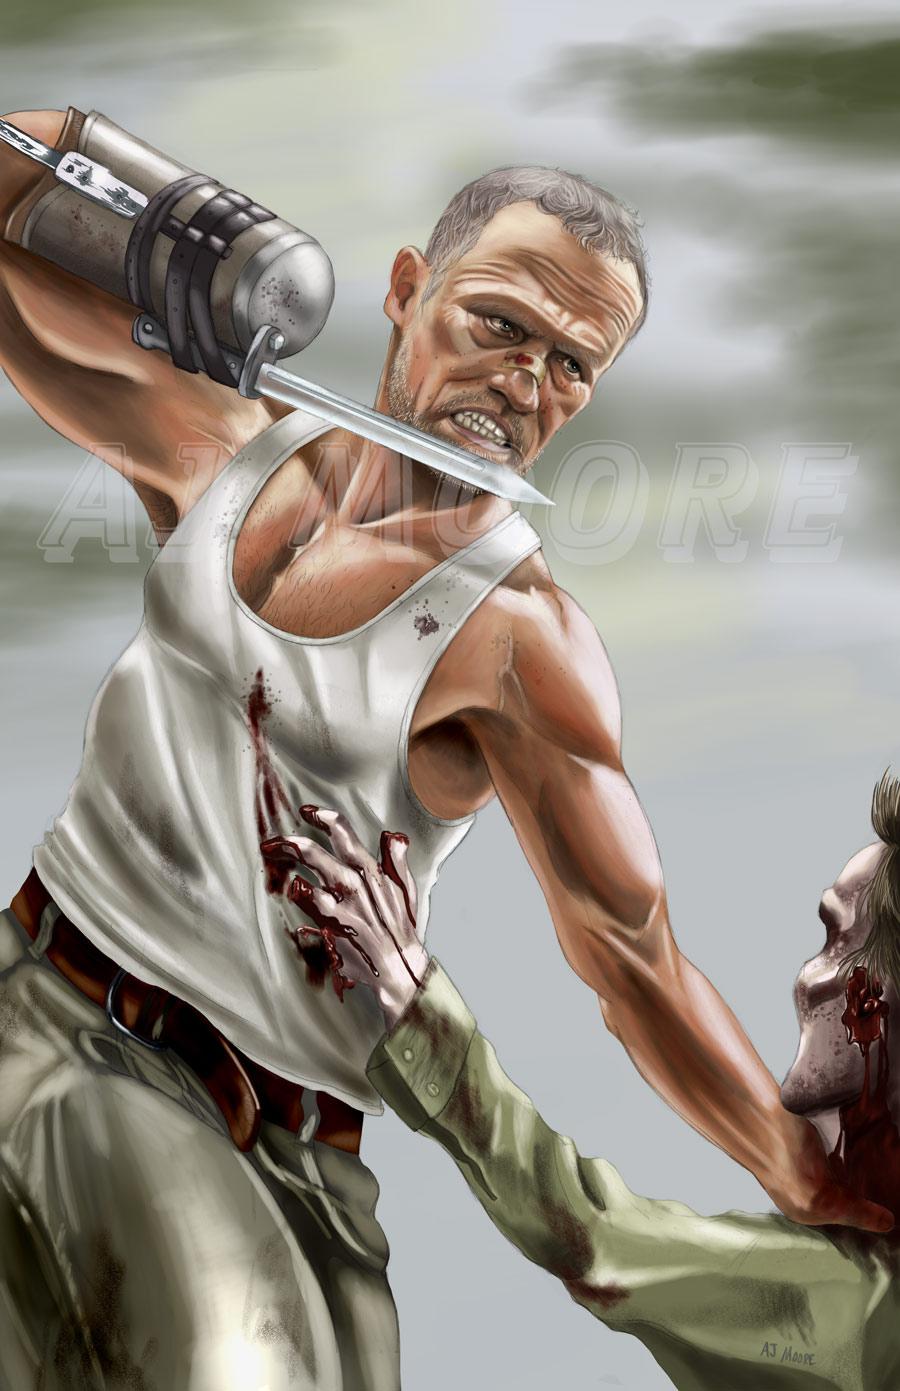 Merle Dixon The Walking Dead: portrayed by Michael Rooker